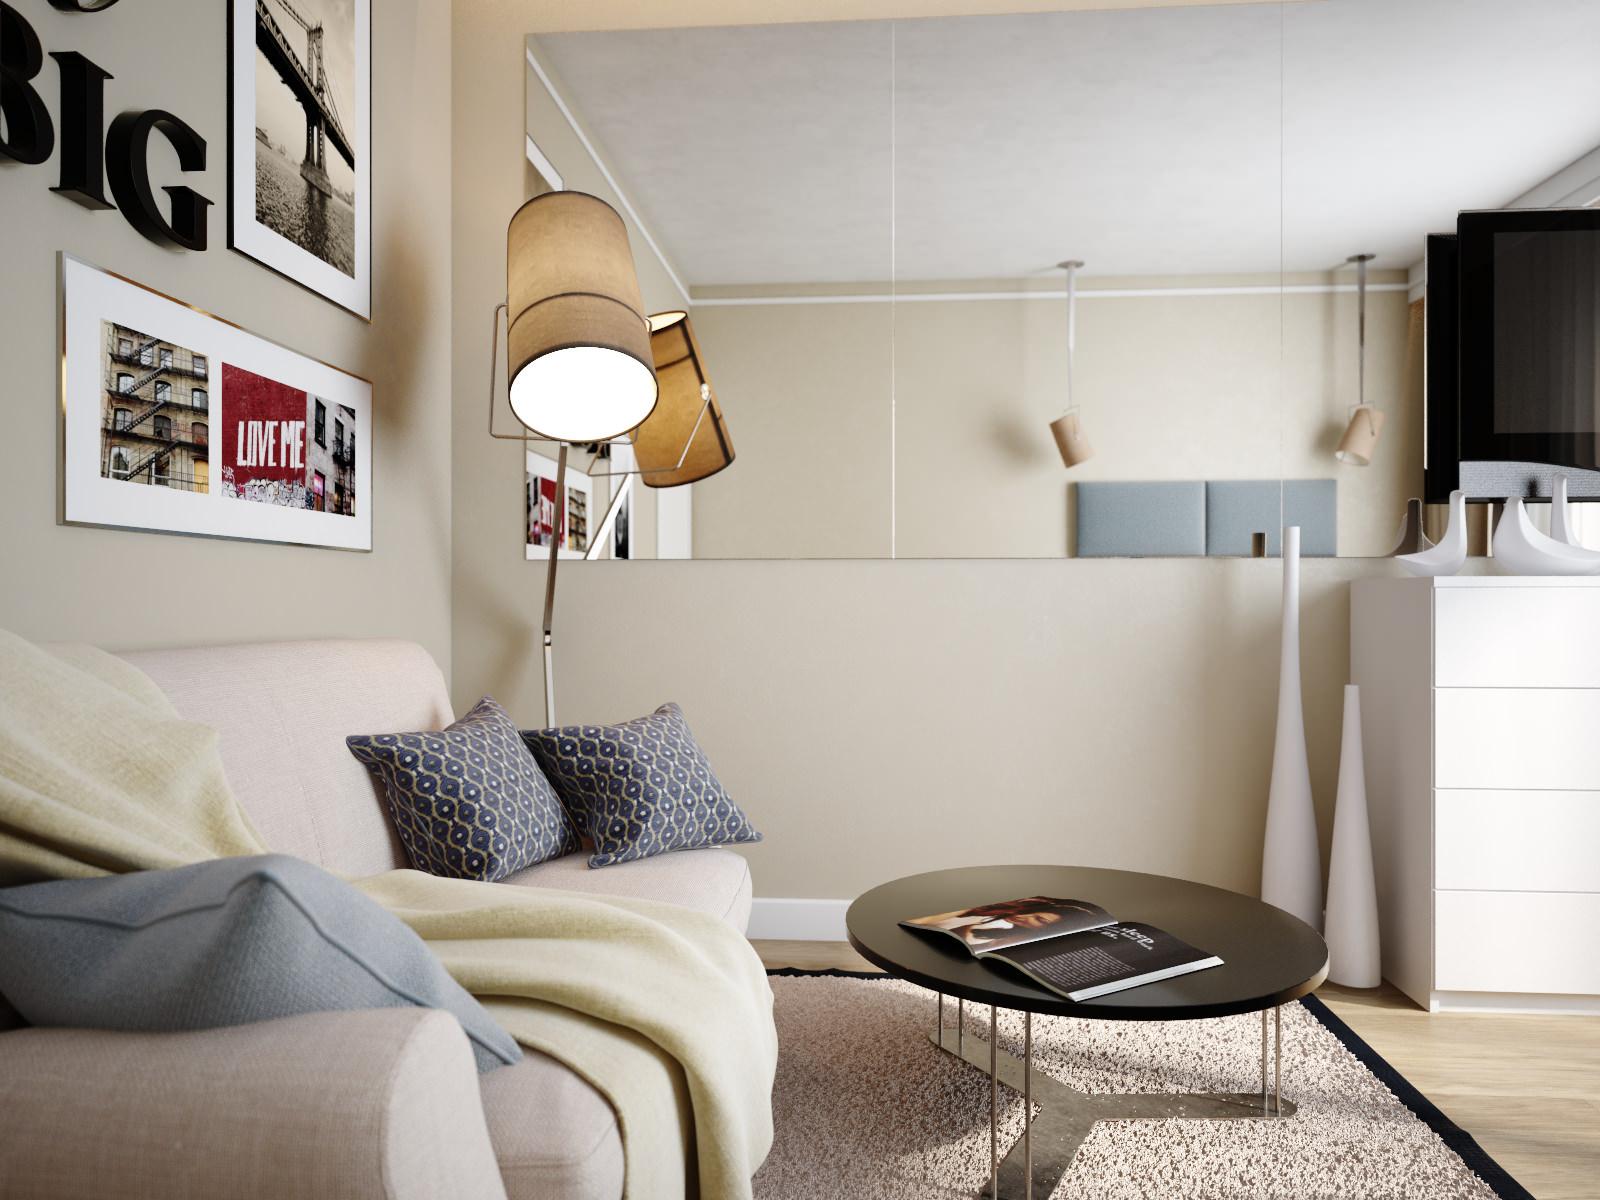 Однокомнатная квартира 40 кв м с бежевыми стенами